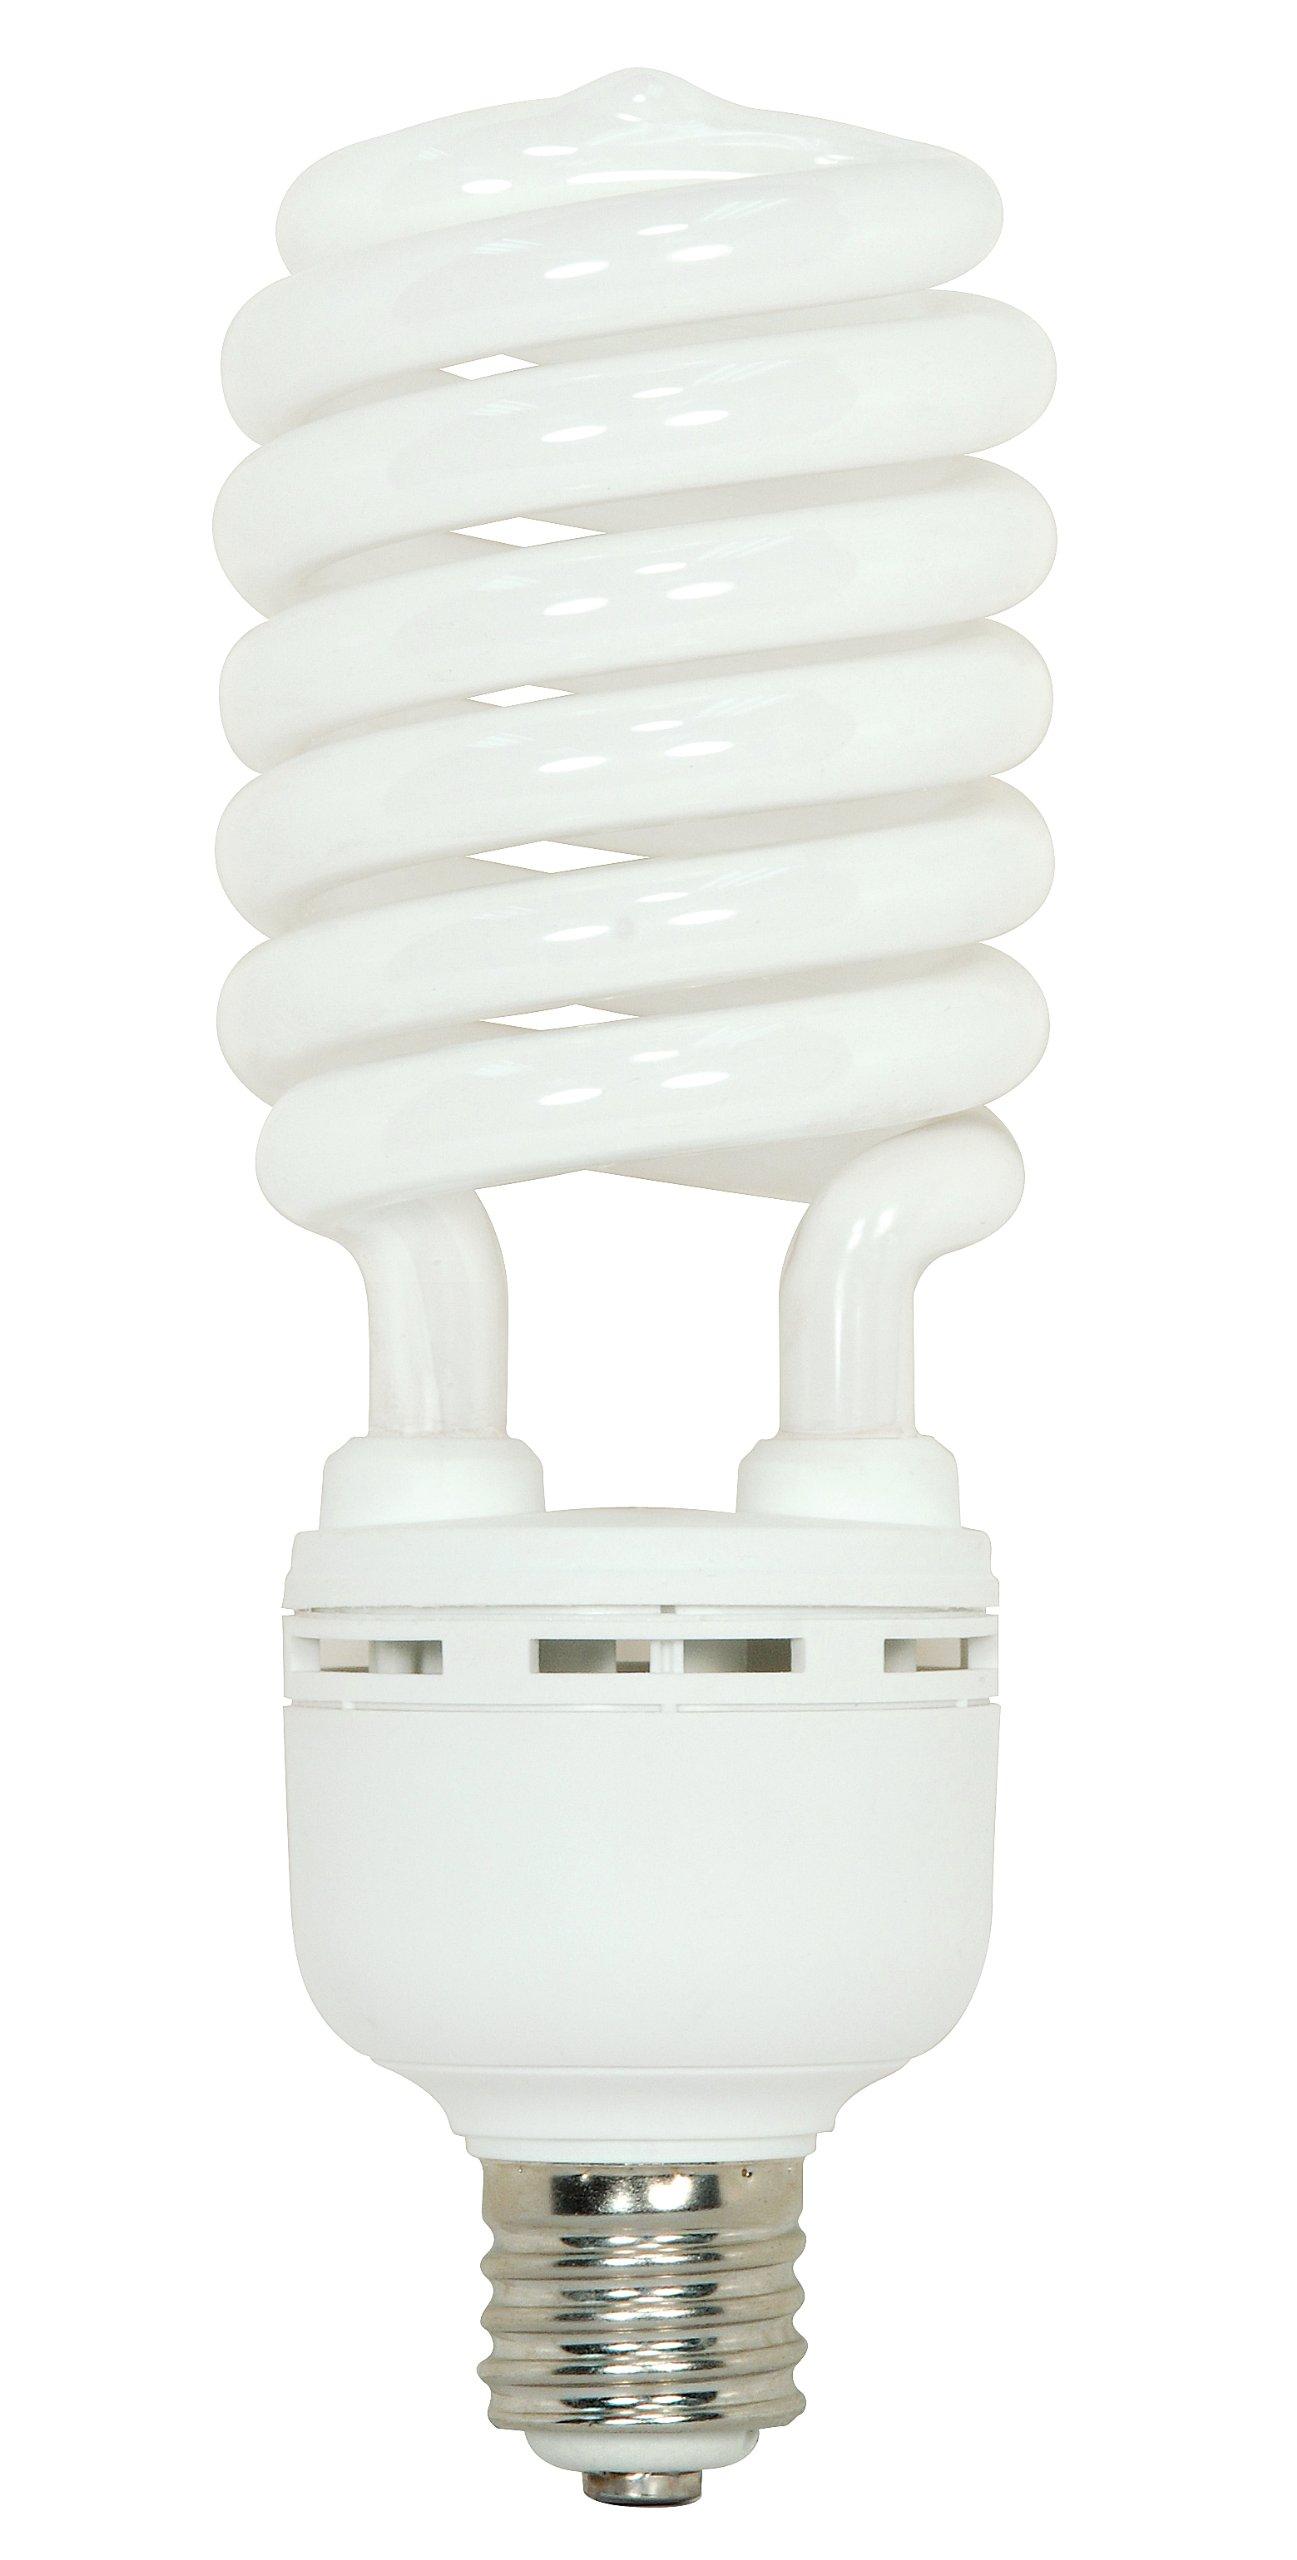 Satco S7395 105 Watt (400 Watt) 7000 Lumens Hi-Pro Spiral CFL Bright White 4100K Mogul Base 120 Volt Light Bulb